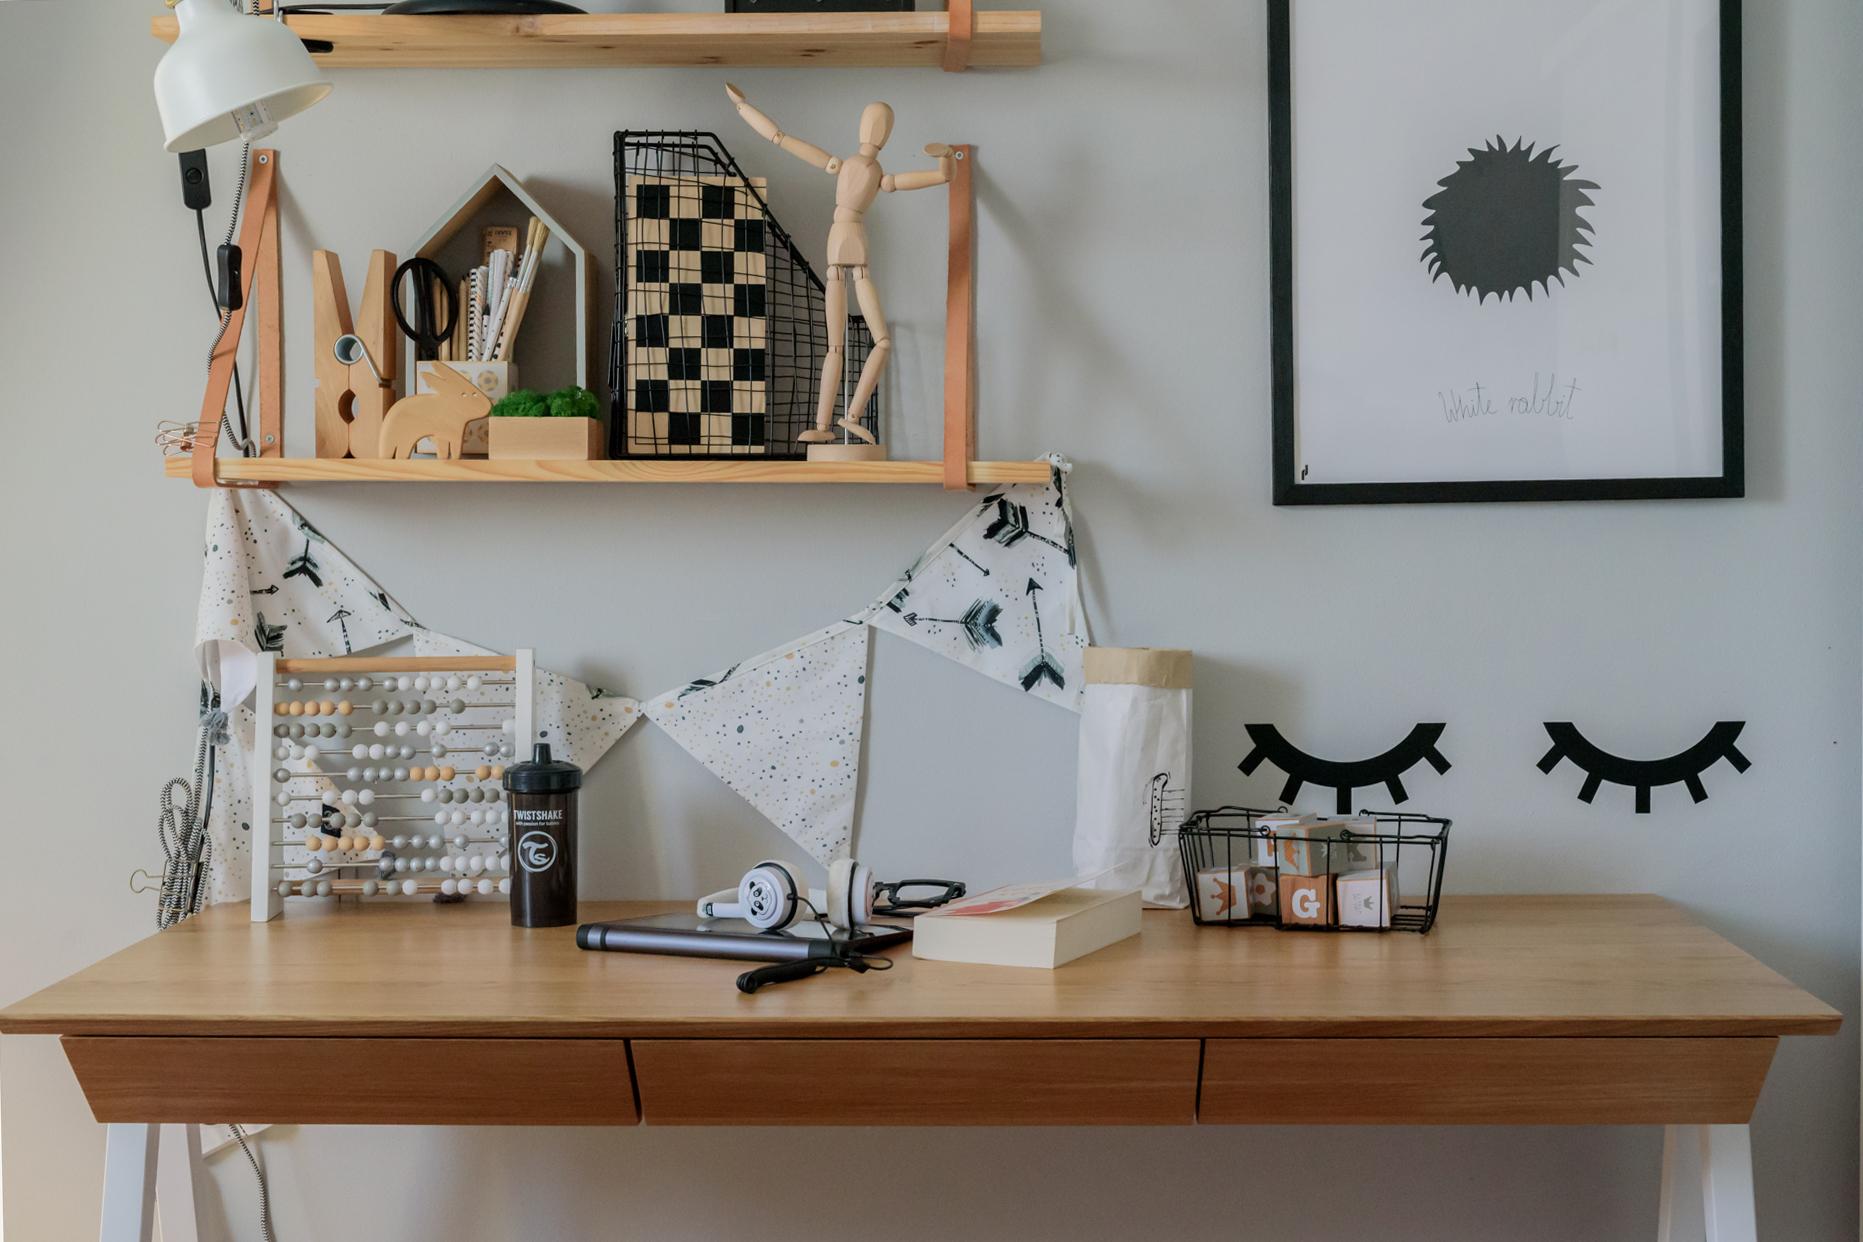 biurko borcas vogel, postawa dziecka przy biurku